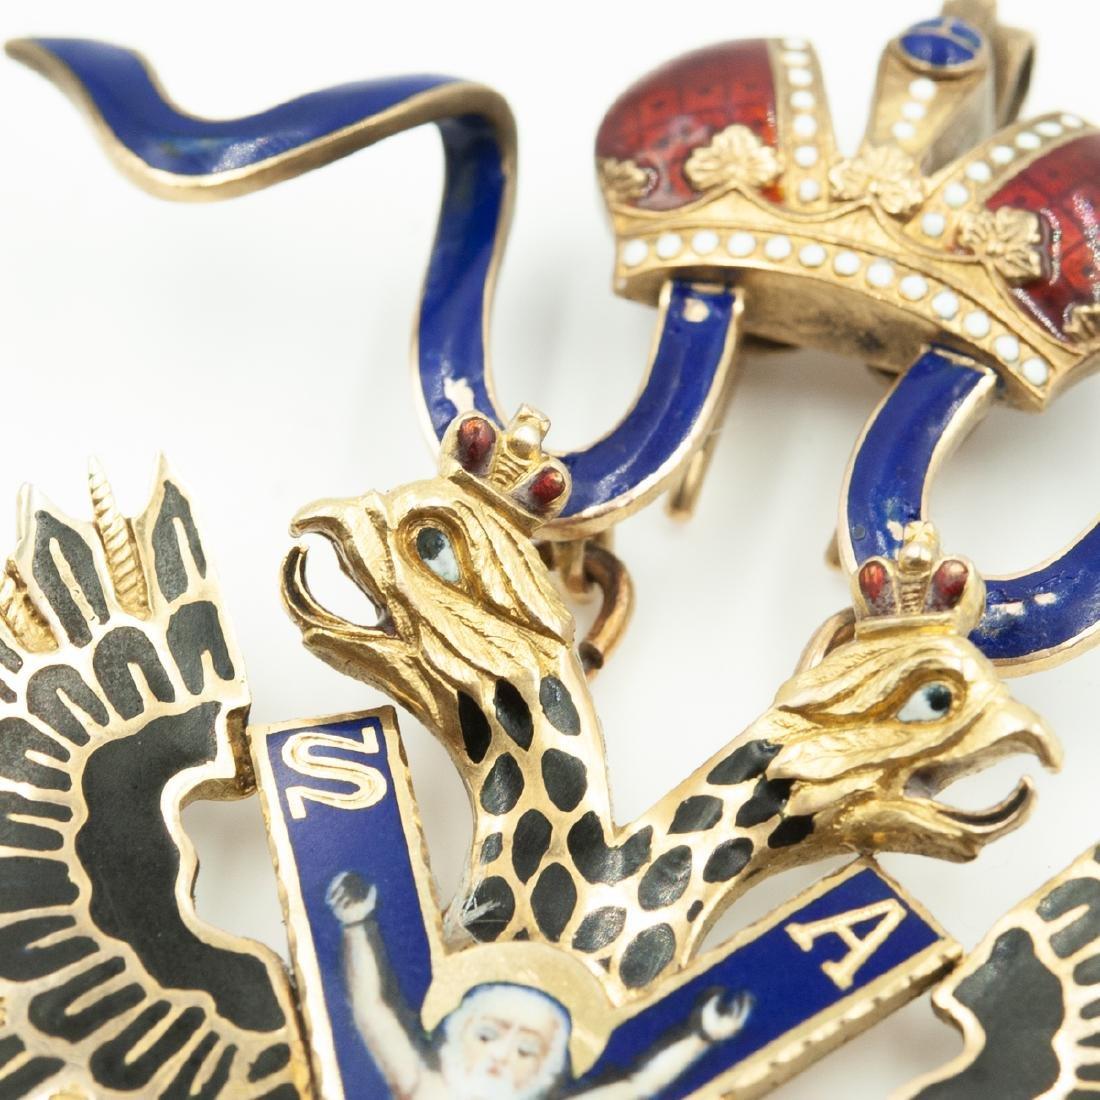 Rare Imperial Russian Gold Enameled Sash Badge - 4